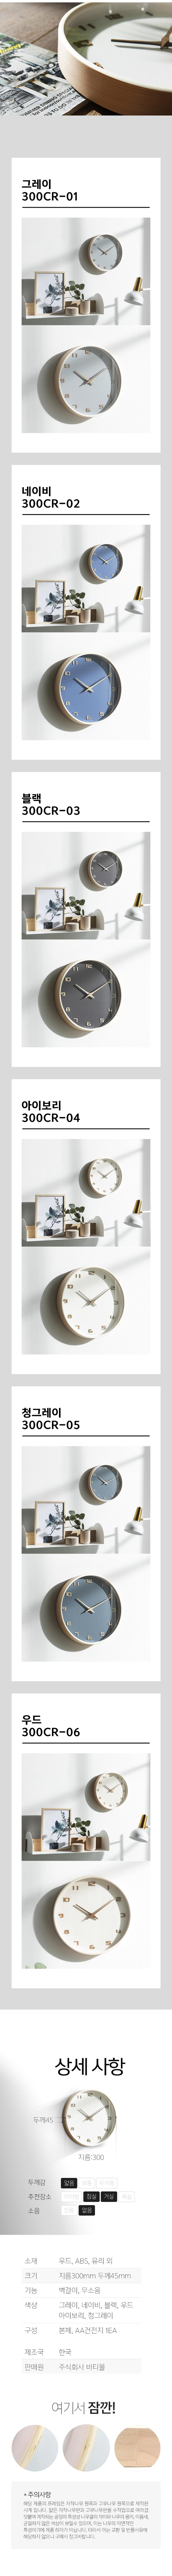 HC 국산 무소음 리얼우드 고급 벽시계 거실 인테리어 예쁜 대형 벽걸이 시계 30CM - 비티몰, 32,500원, 벽시계, 무소음/저소음